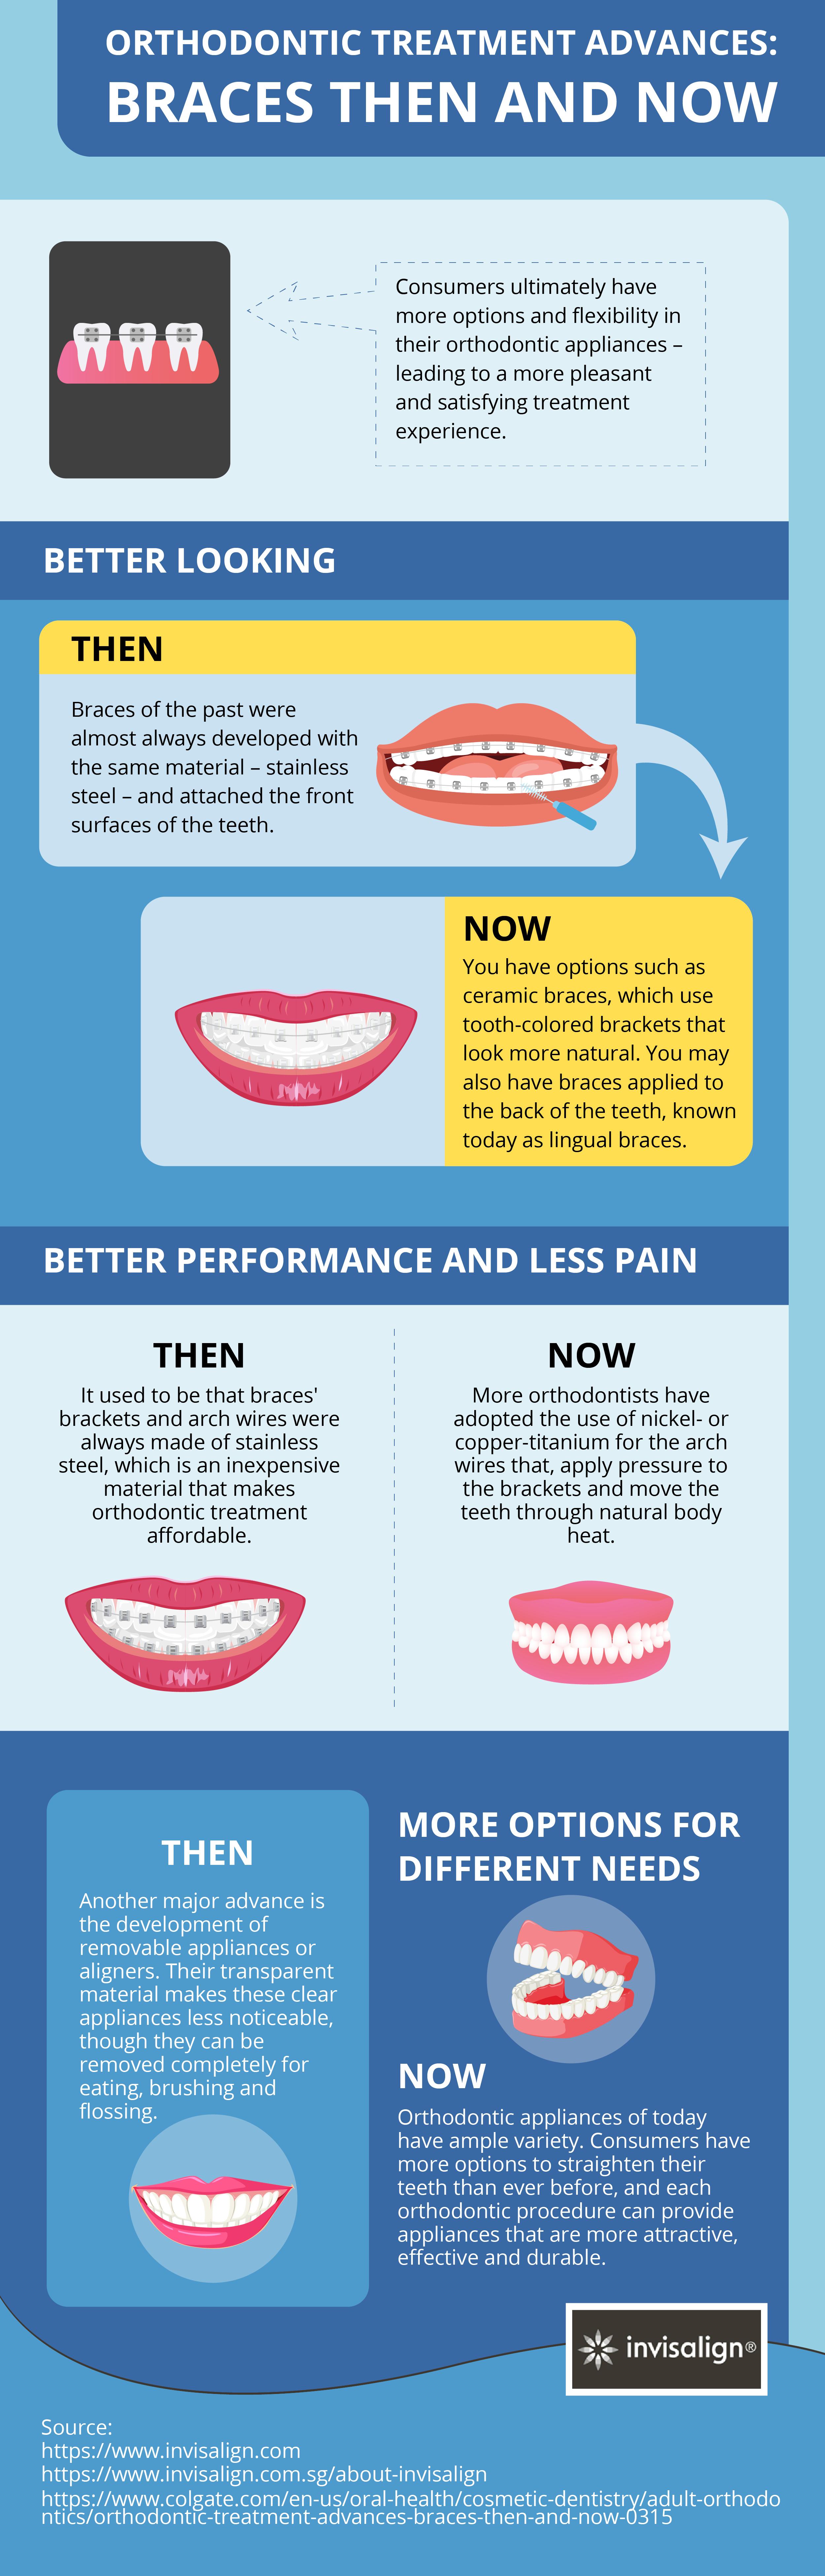 Pin by Singaporeinvisalign on Orthodontic Treatment Advances: Braces ...